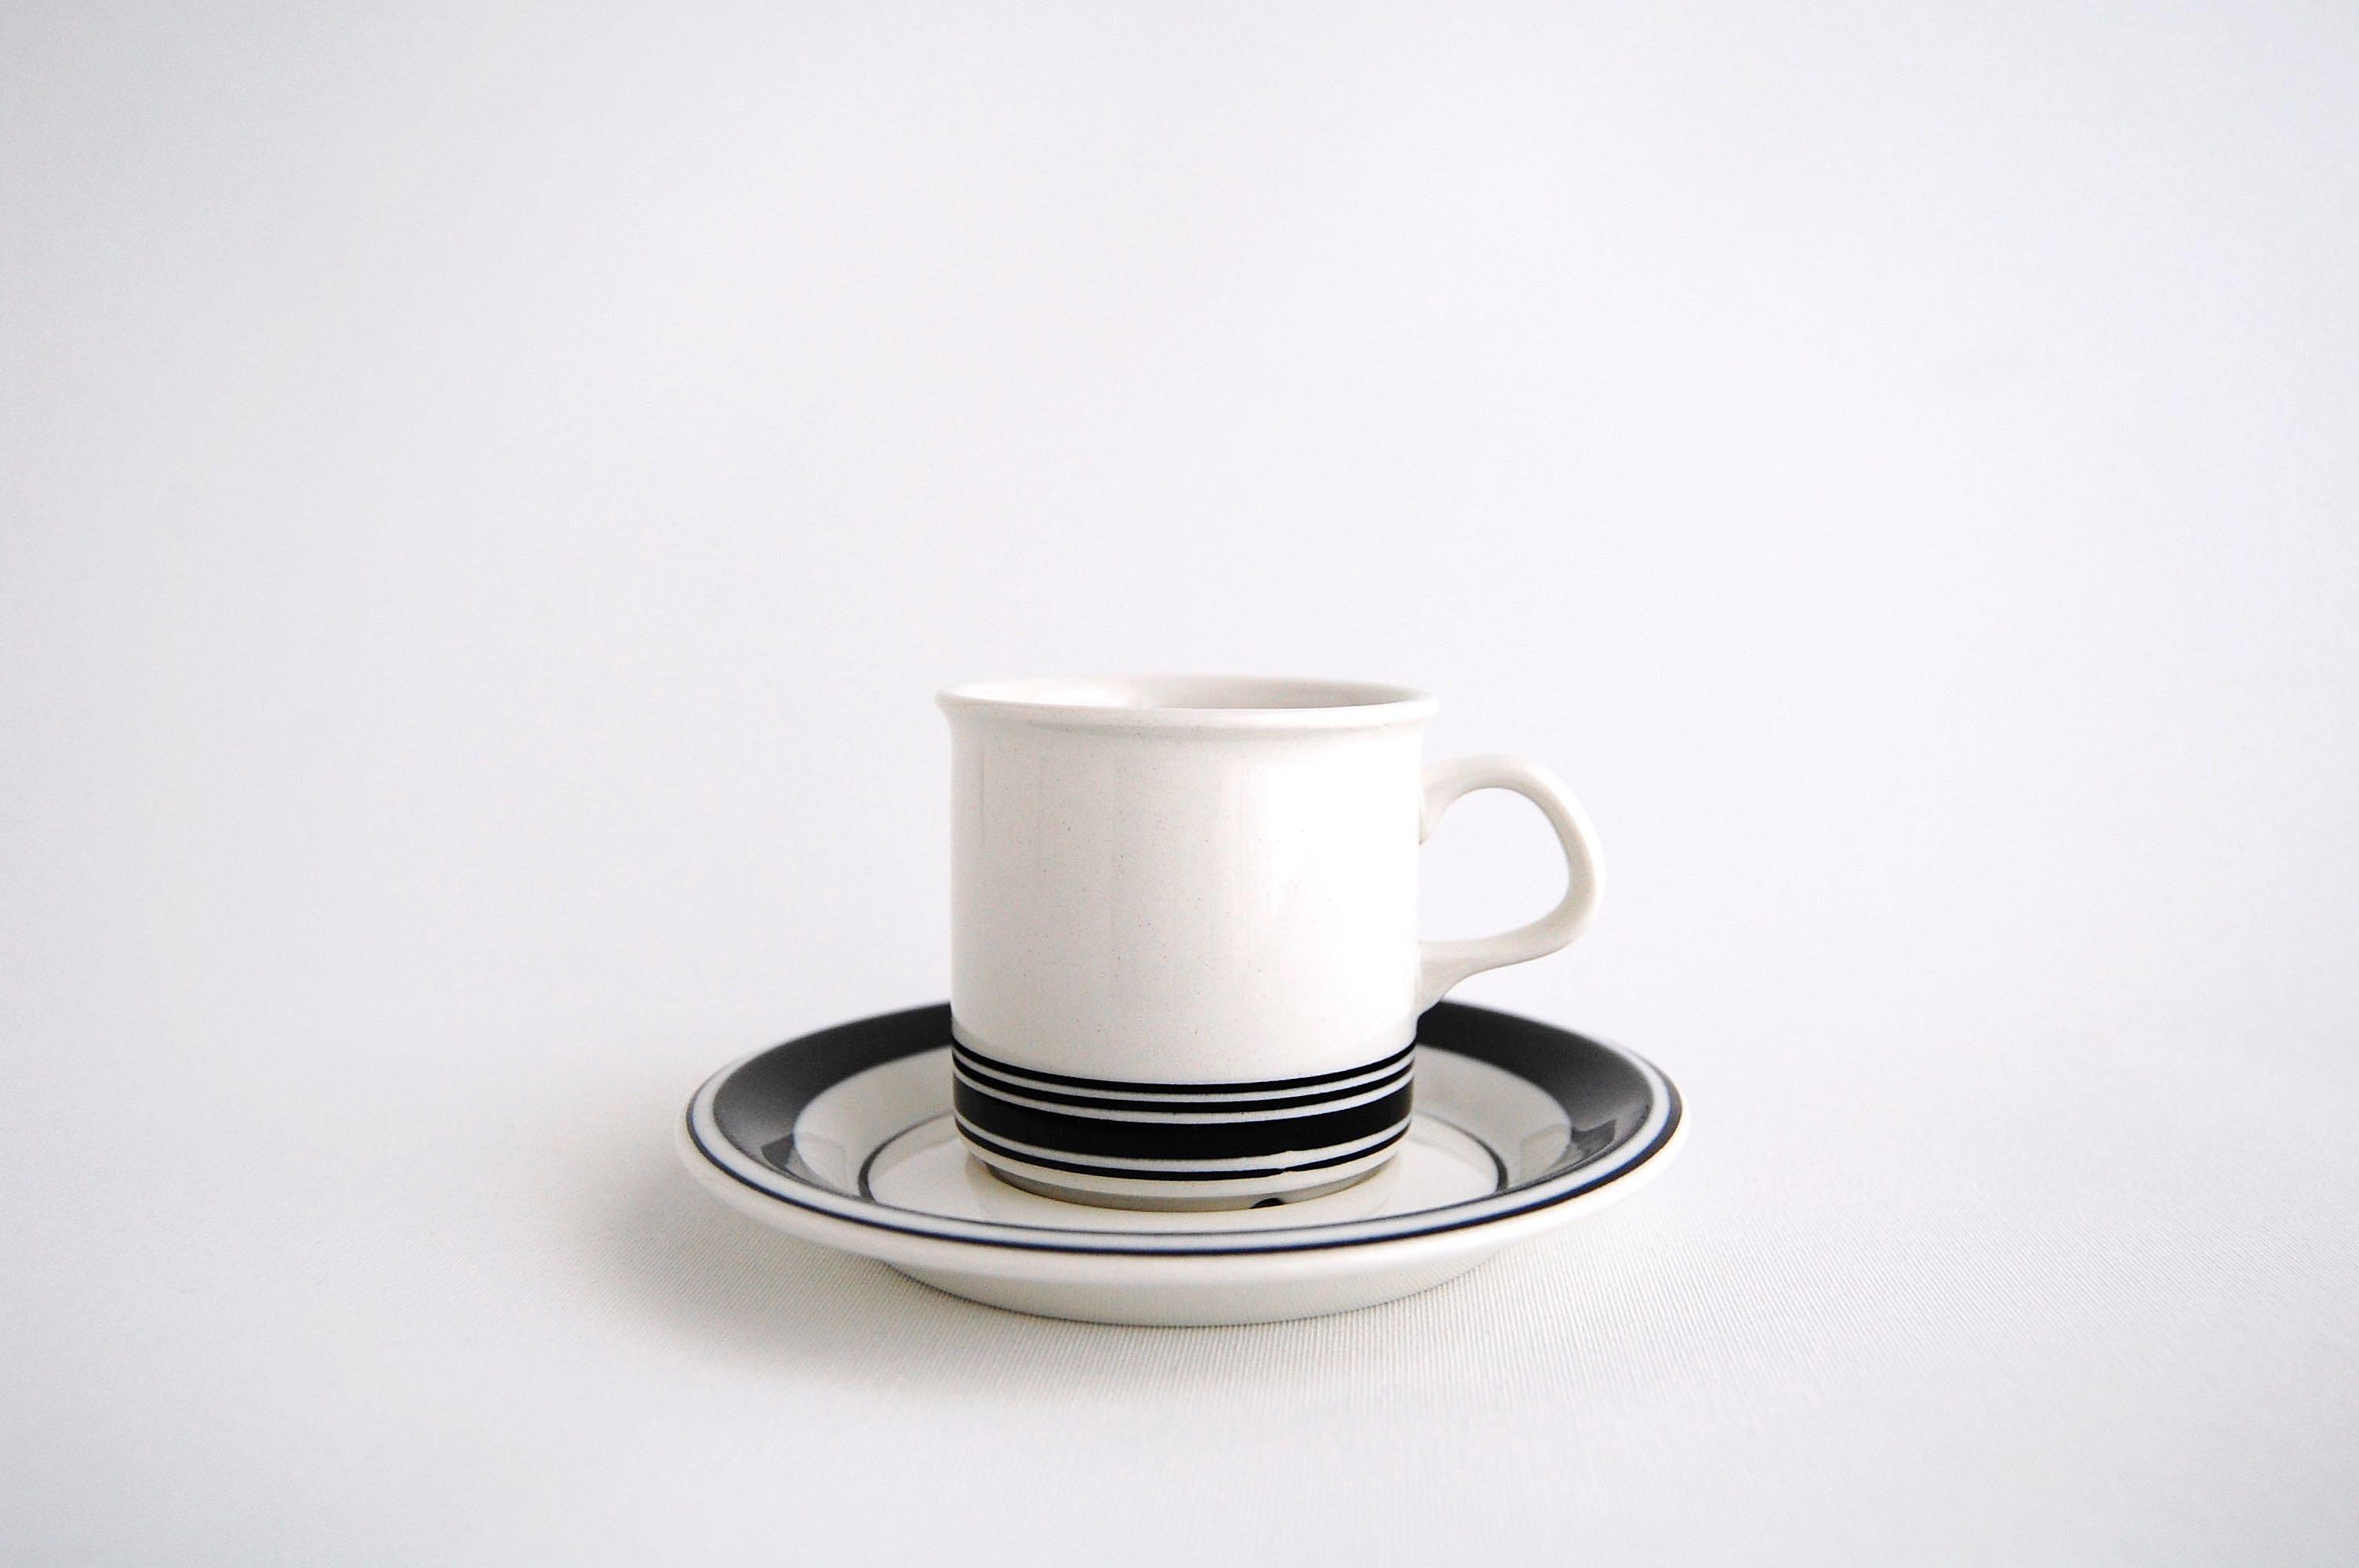 ARABIA/アラビア Faenza/ファエンツァ コーヒーカップ&ソーサー ブラックライン 002